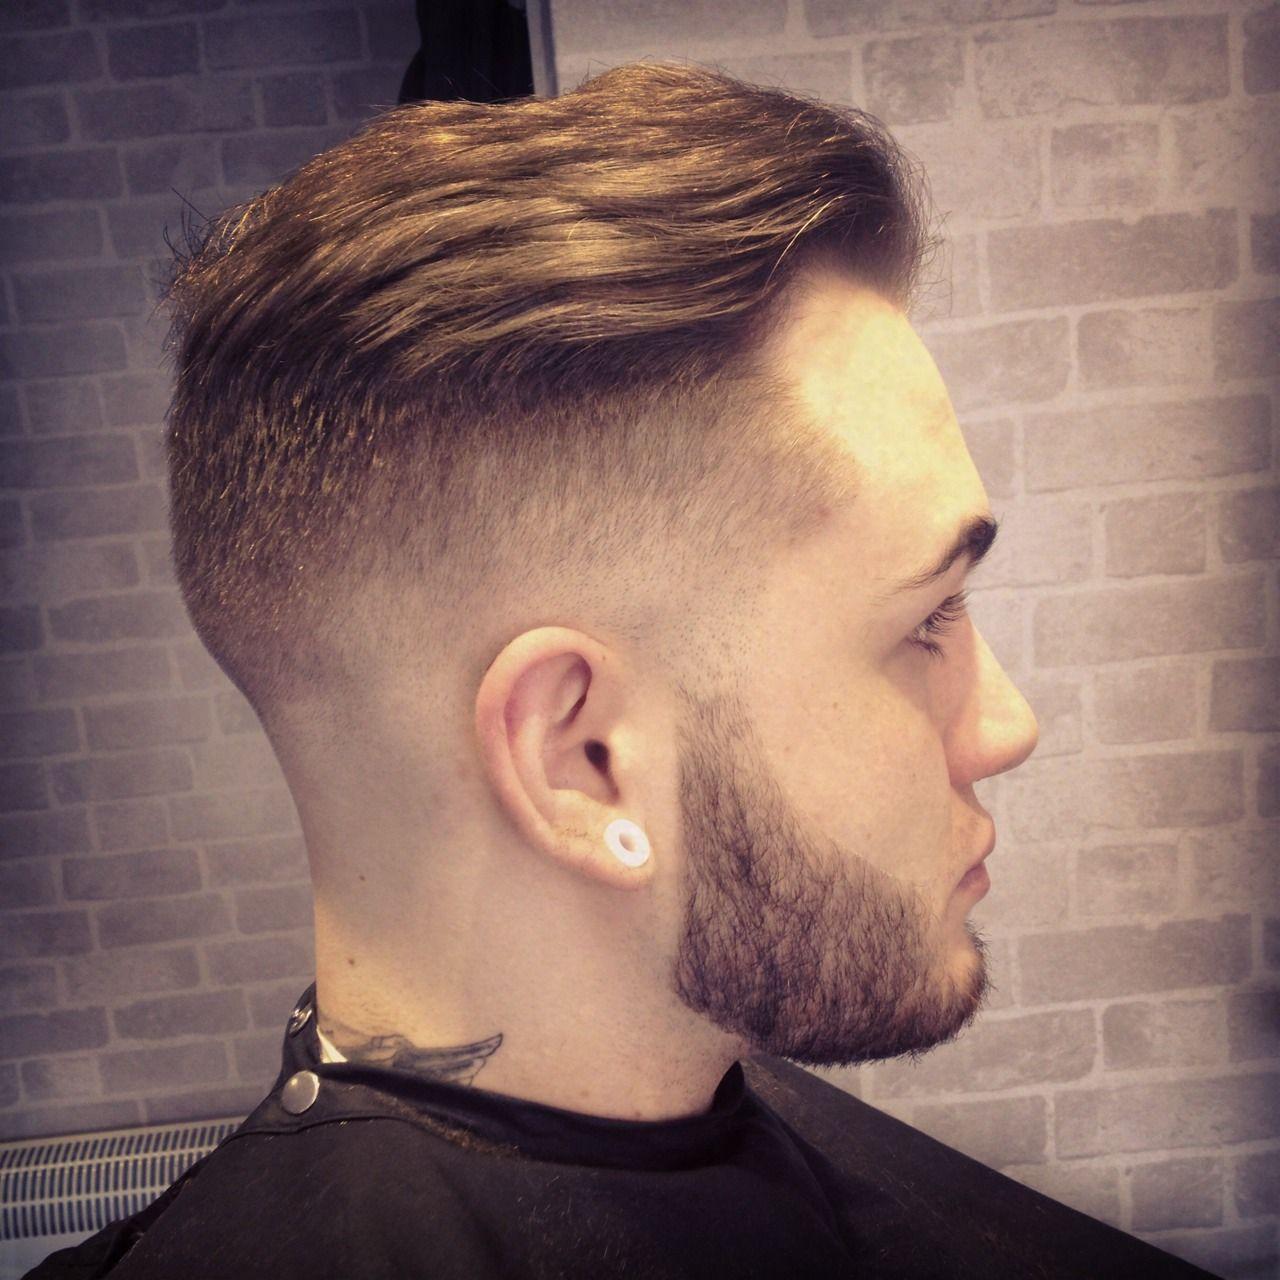 Comb Over Fade Askcom Image Search Haircuts Pinterest - High taper fade haircut